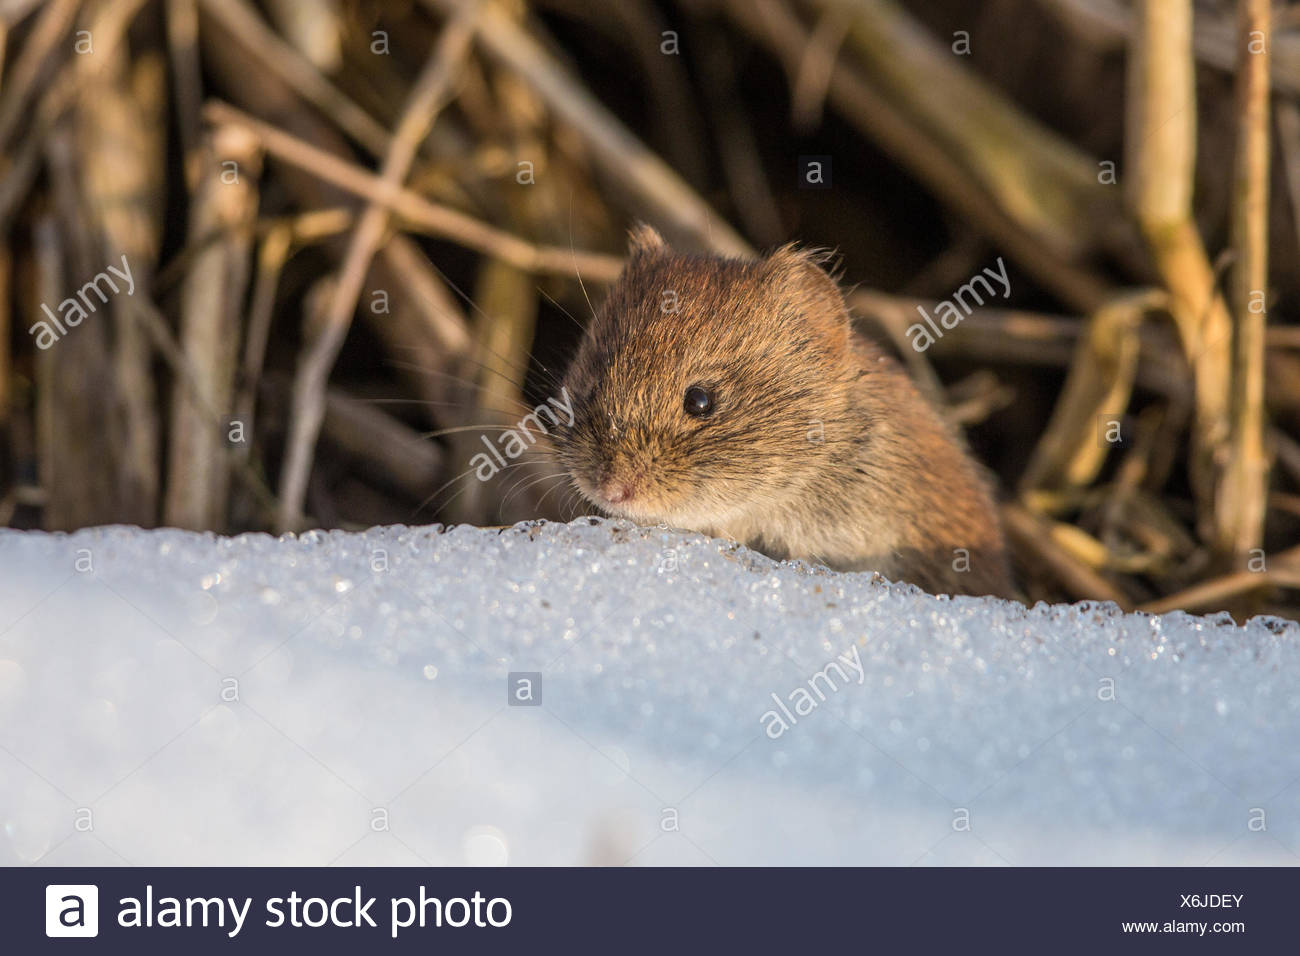 bank vole (Clethrionomys glareolus, Myodes glareolus), portrait over snow, Germany, Bavaria, Lake Chiemsee - Stock Image